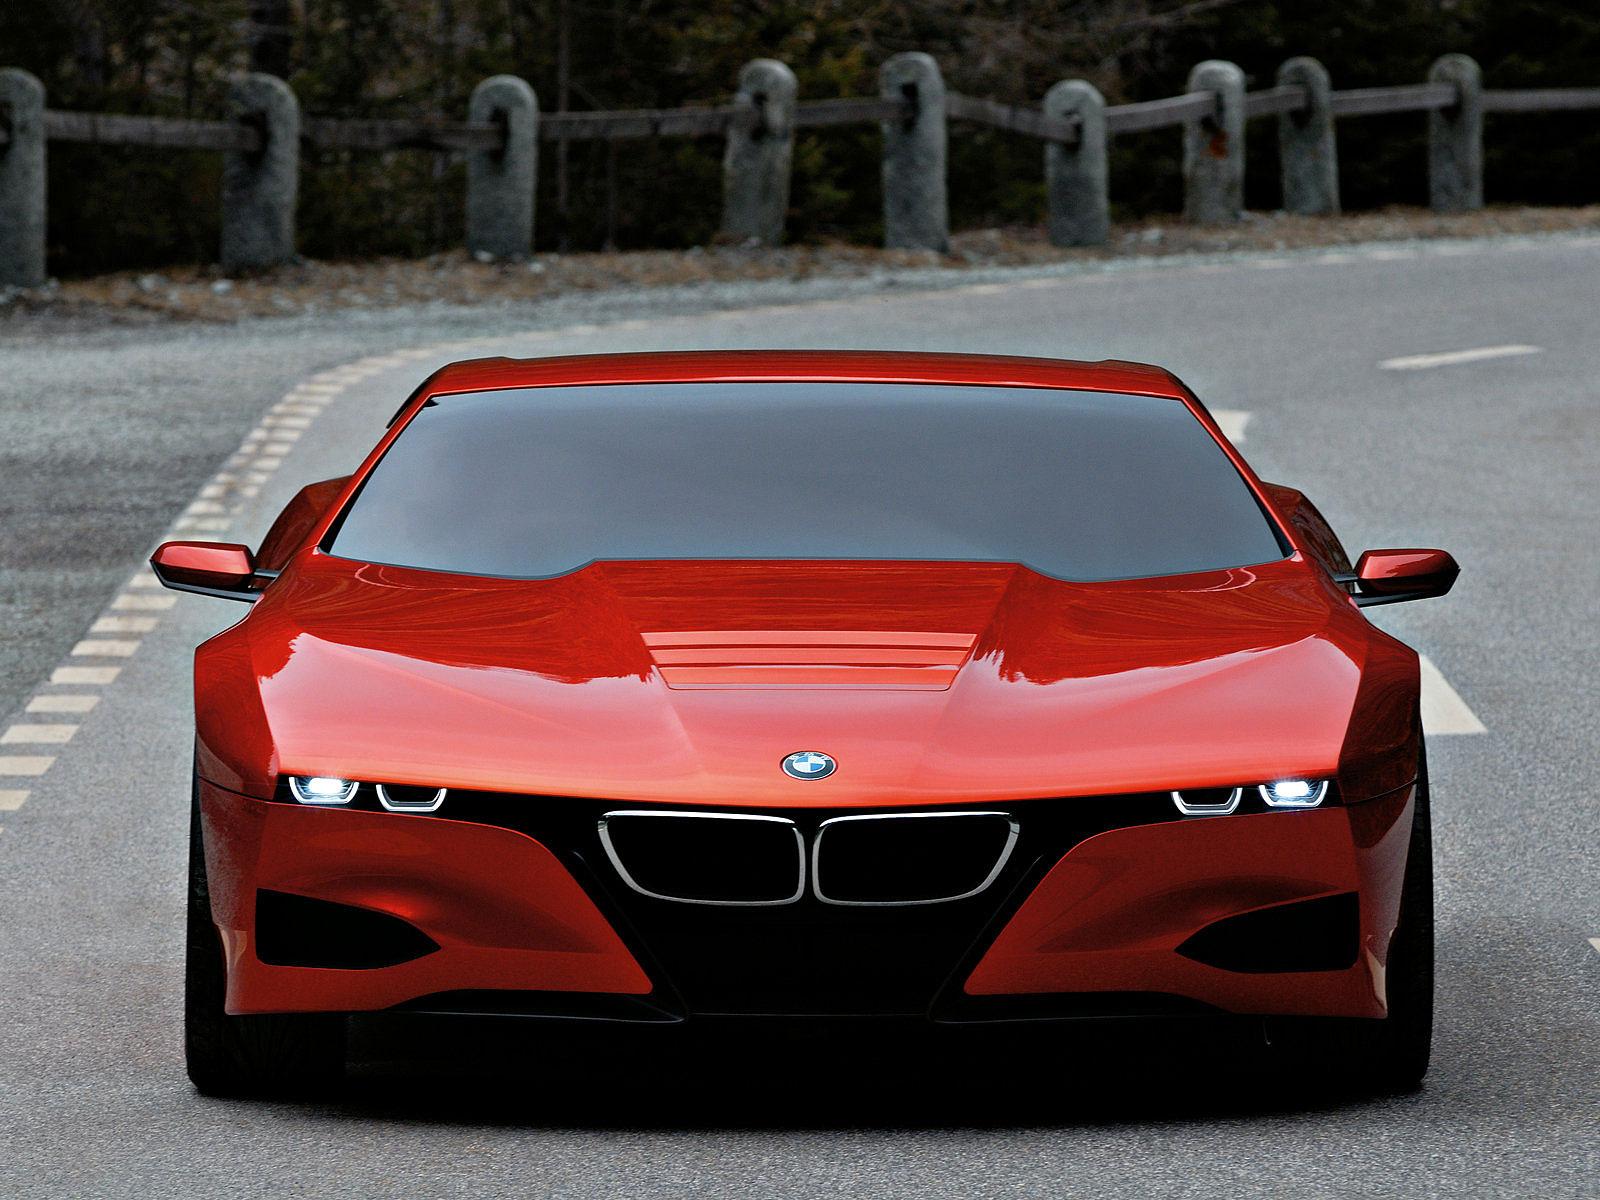 http://1.bp.blogspot.com/-CXj9l4yBaG8/TZJeII6Uf5I/AAAAAAAAALI/OxPfofxrVeA/s1600/BMW-M1_Concept006.jpg